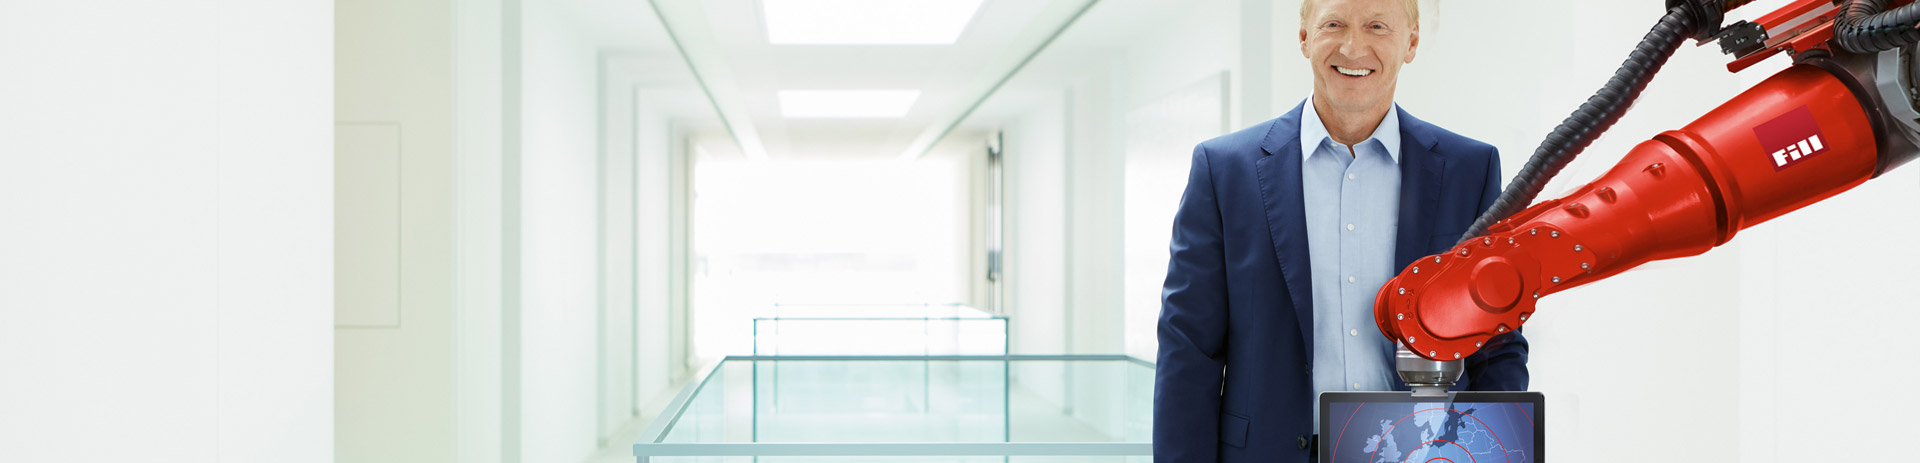 Geschäftsführer Fill GmbH hinter Robotics-Arm